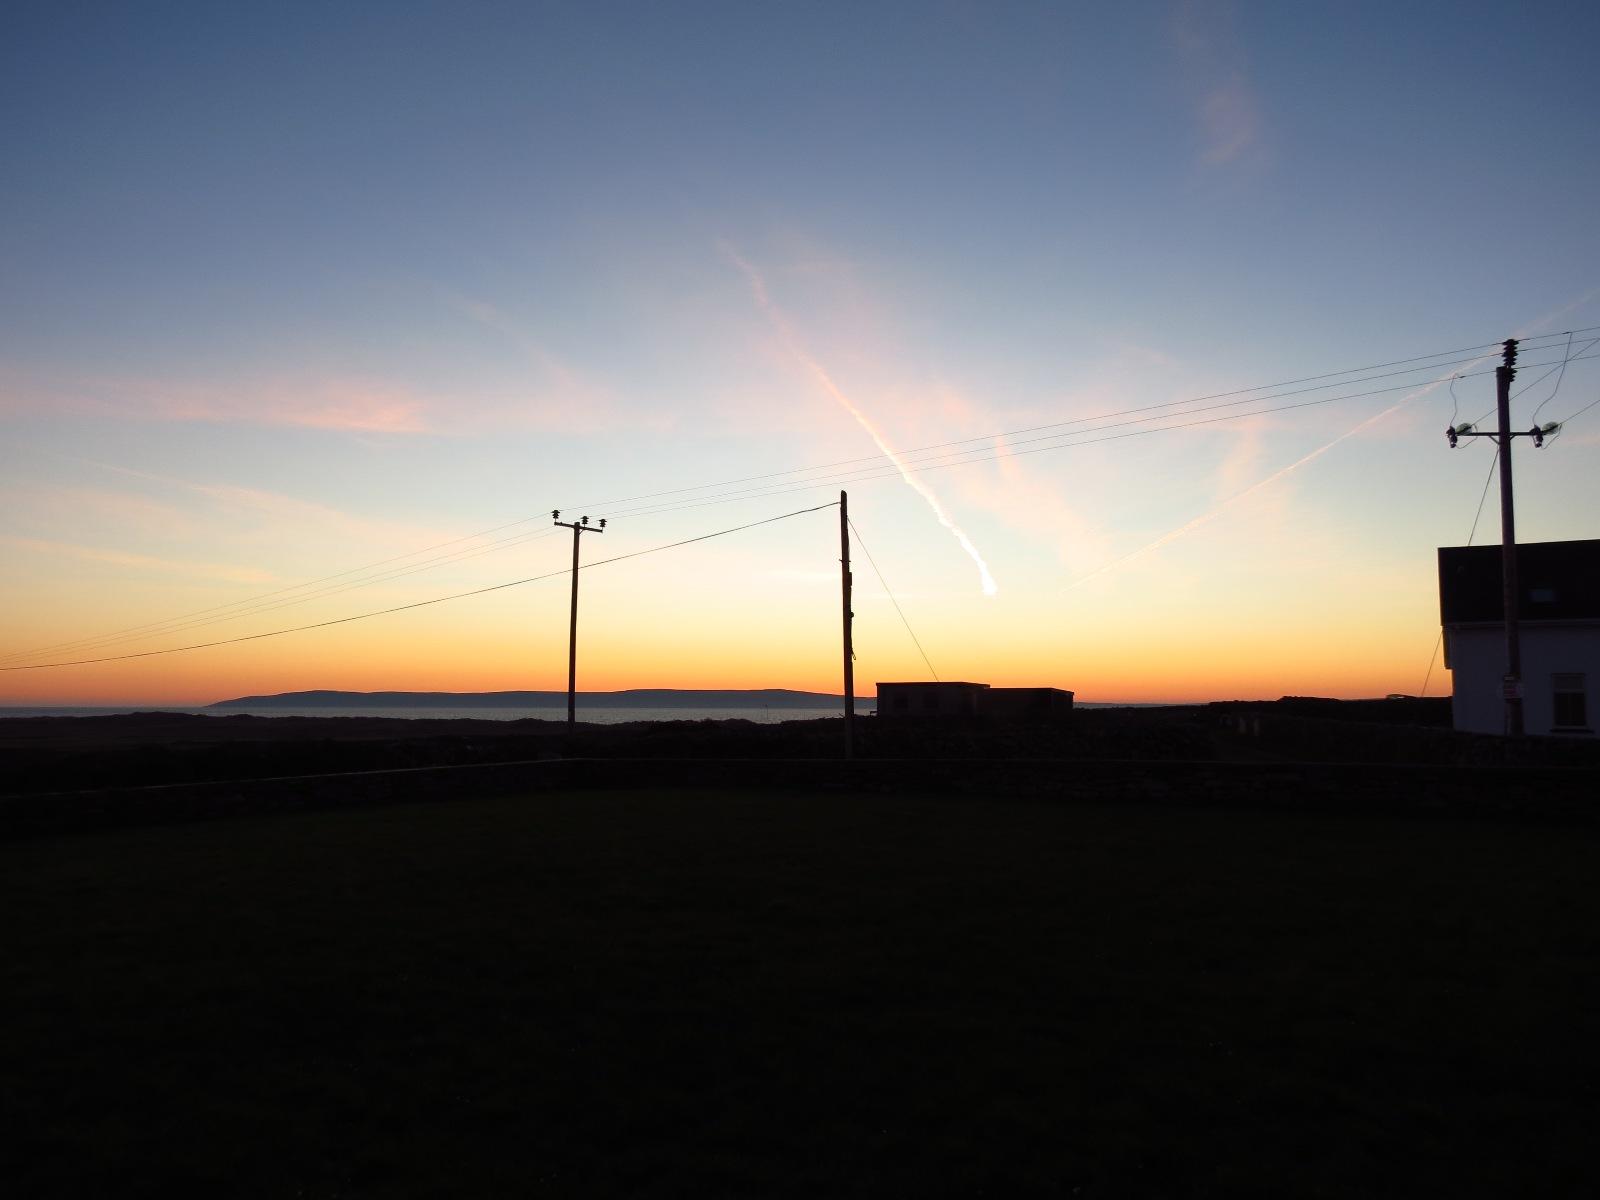 sunrise 25 Feb 2013 (15)